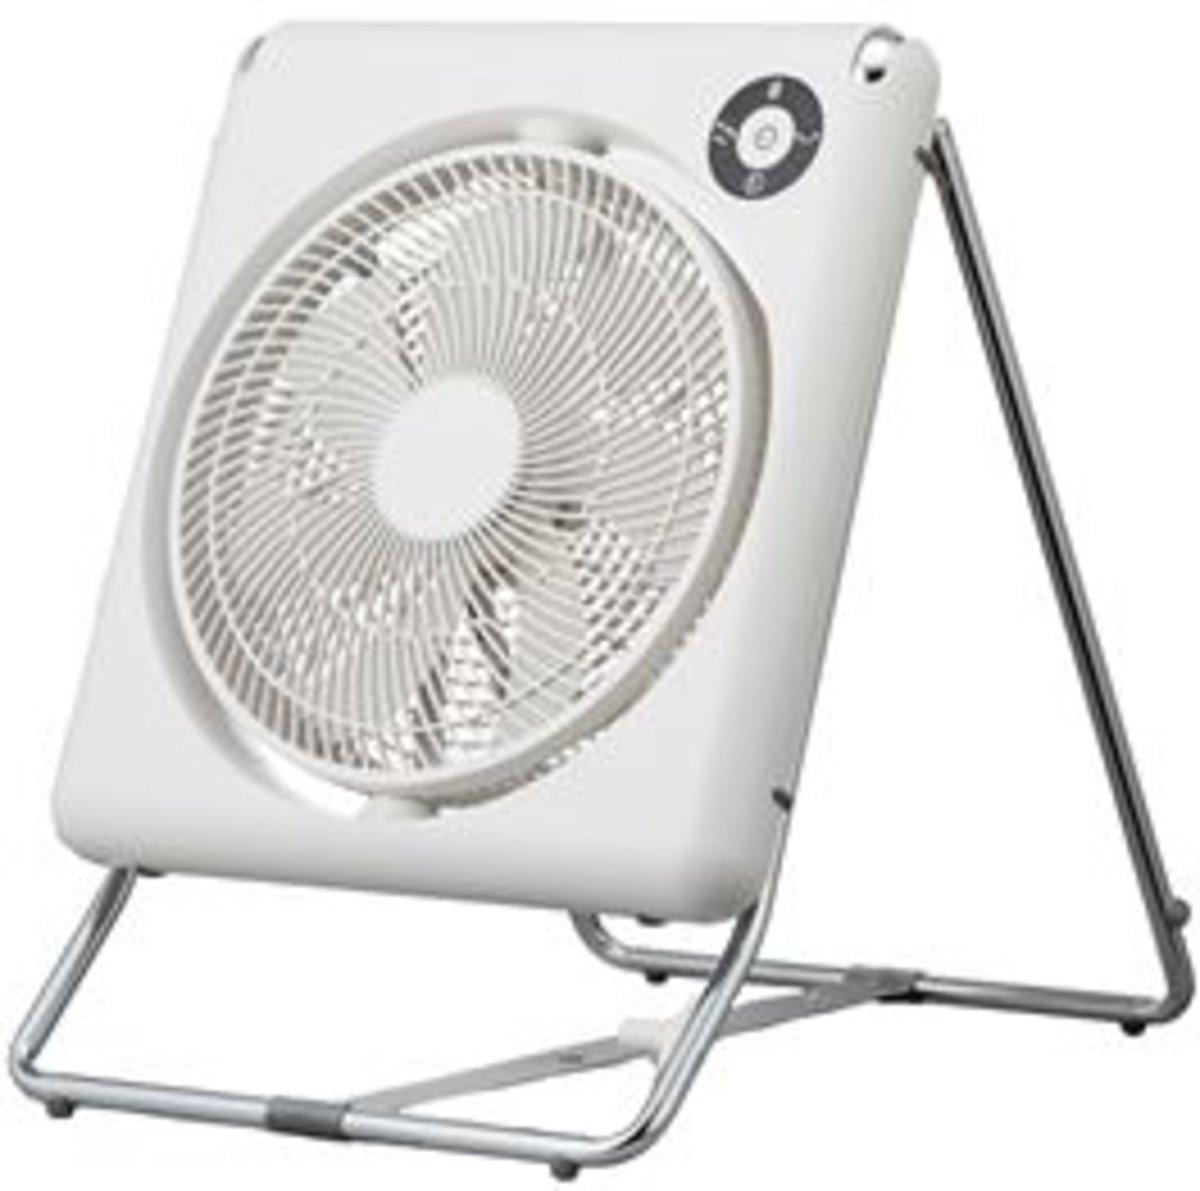 "FLU-254DHK/W Multi-directional Compact DC Folding Fan (10"" / 25cm)"